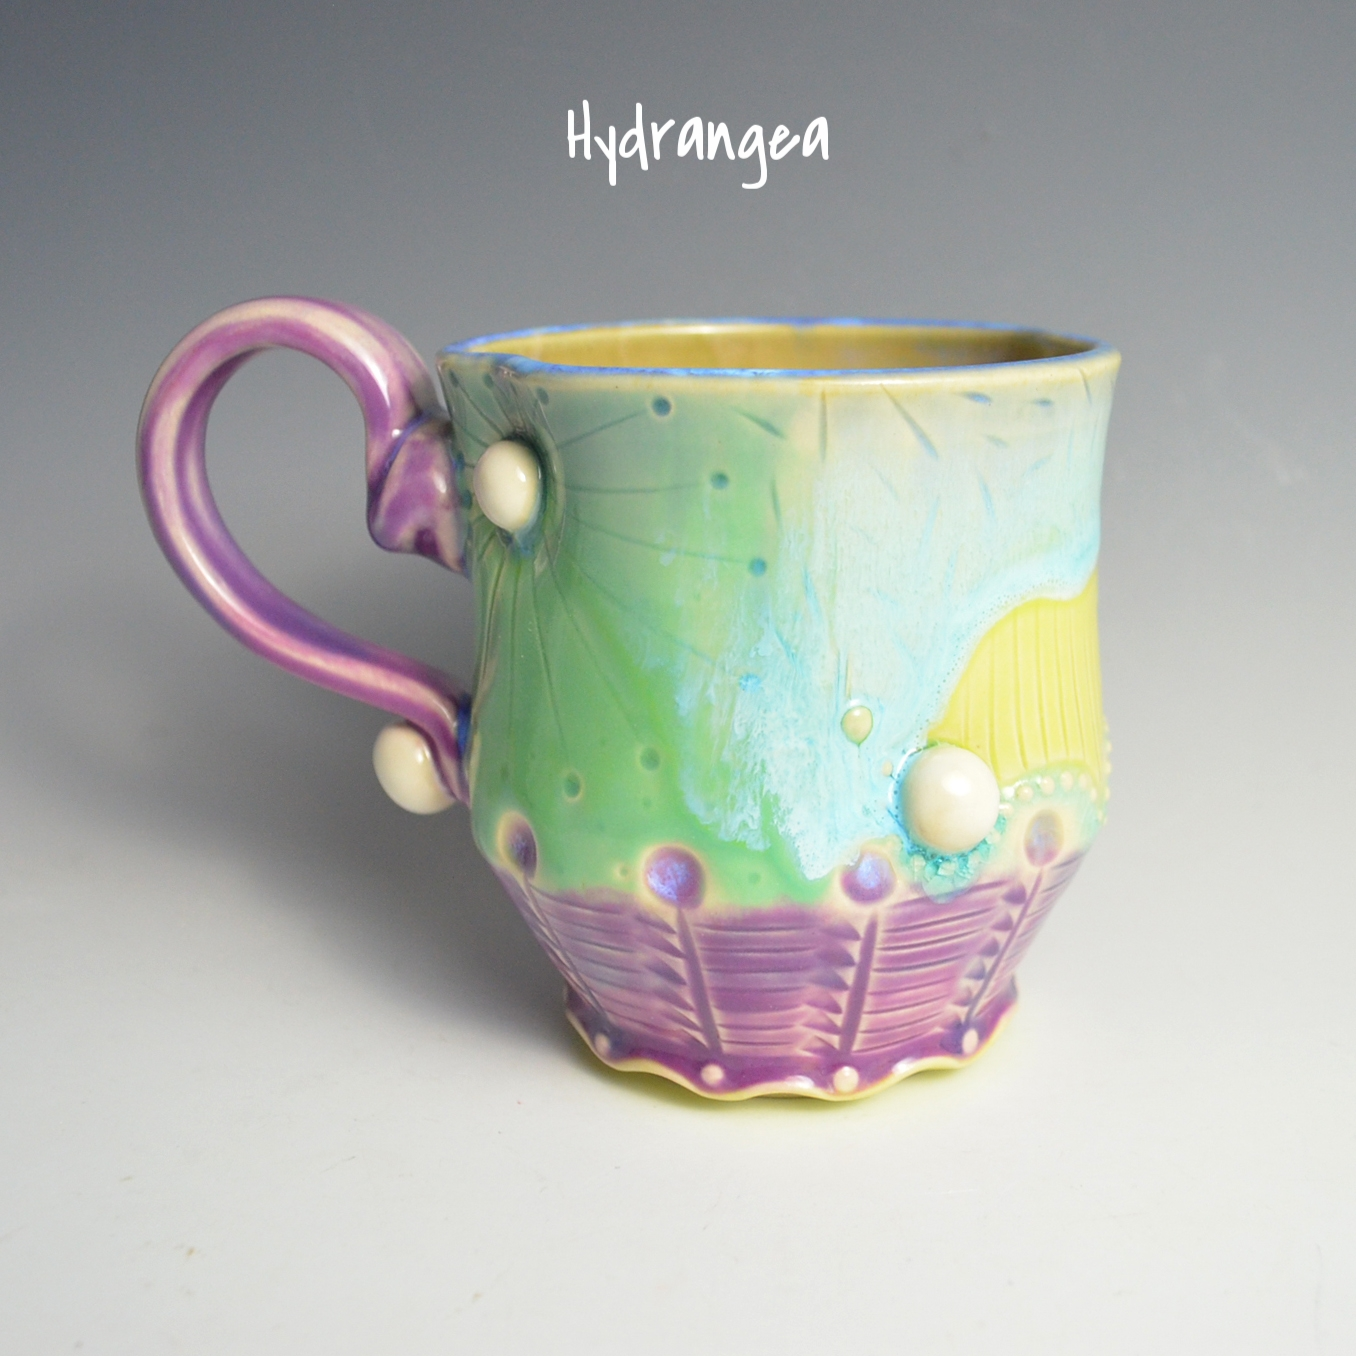 2676 - #6 Hydrangea.JPG